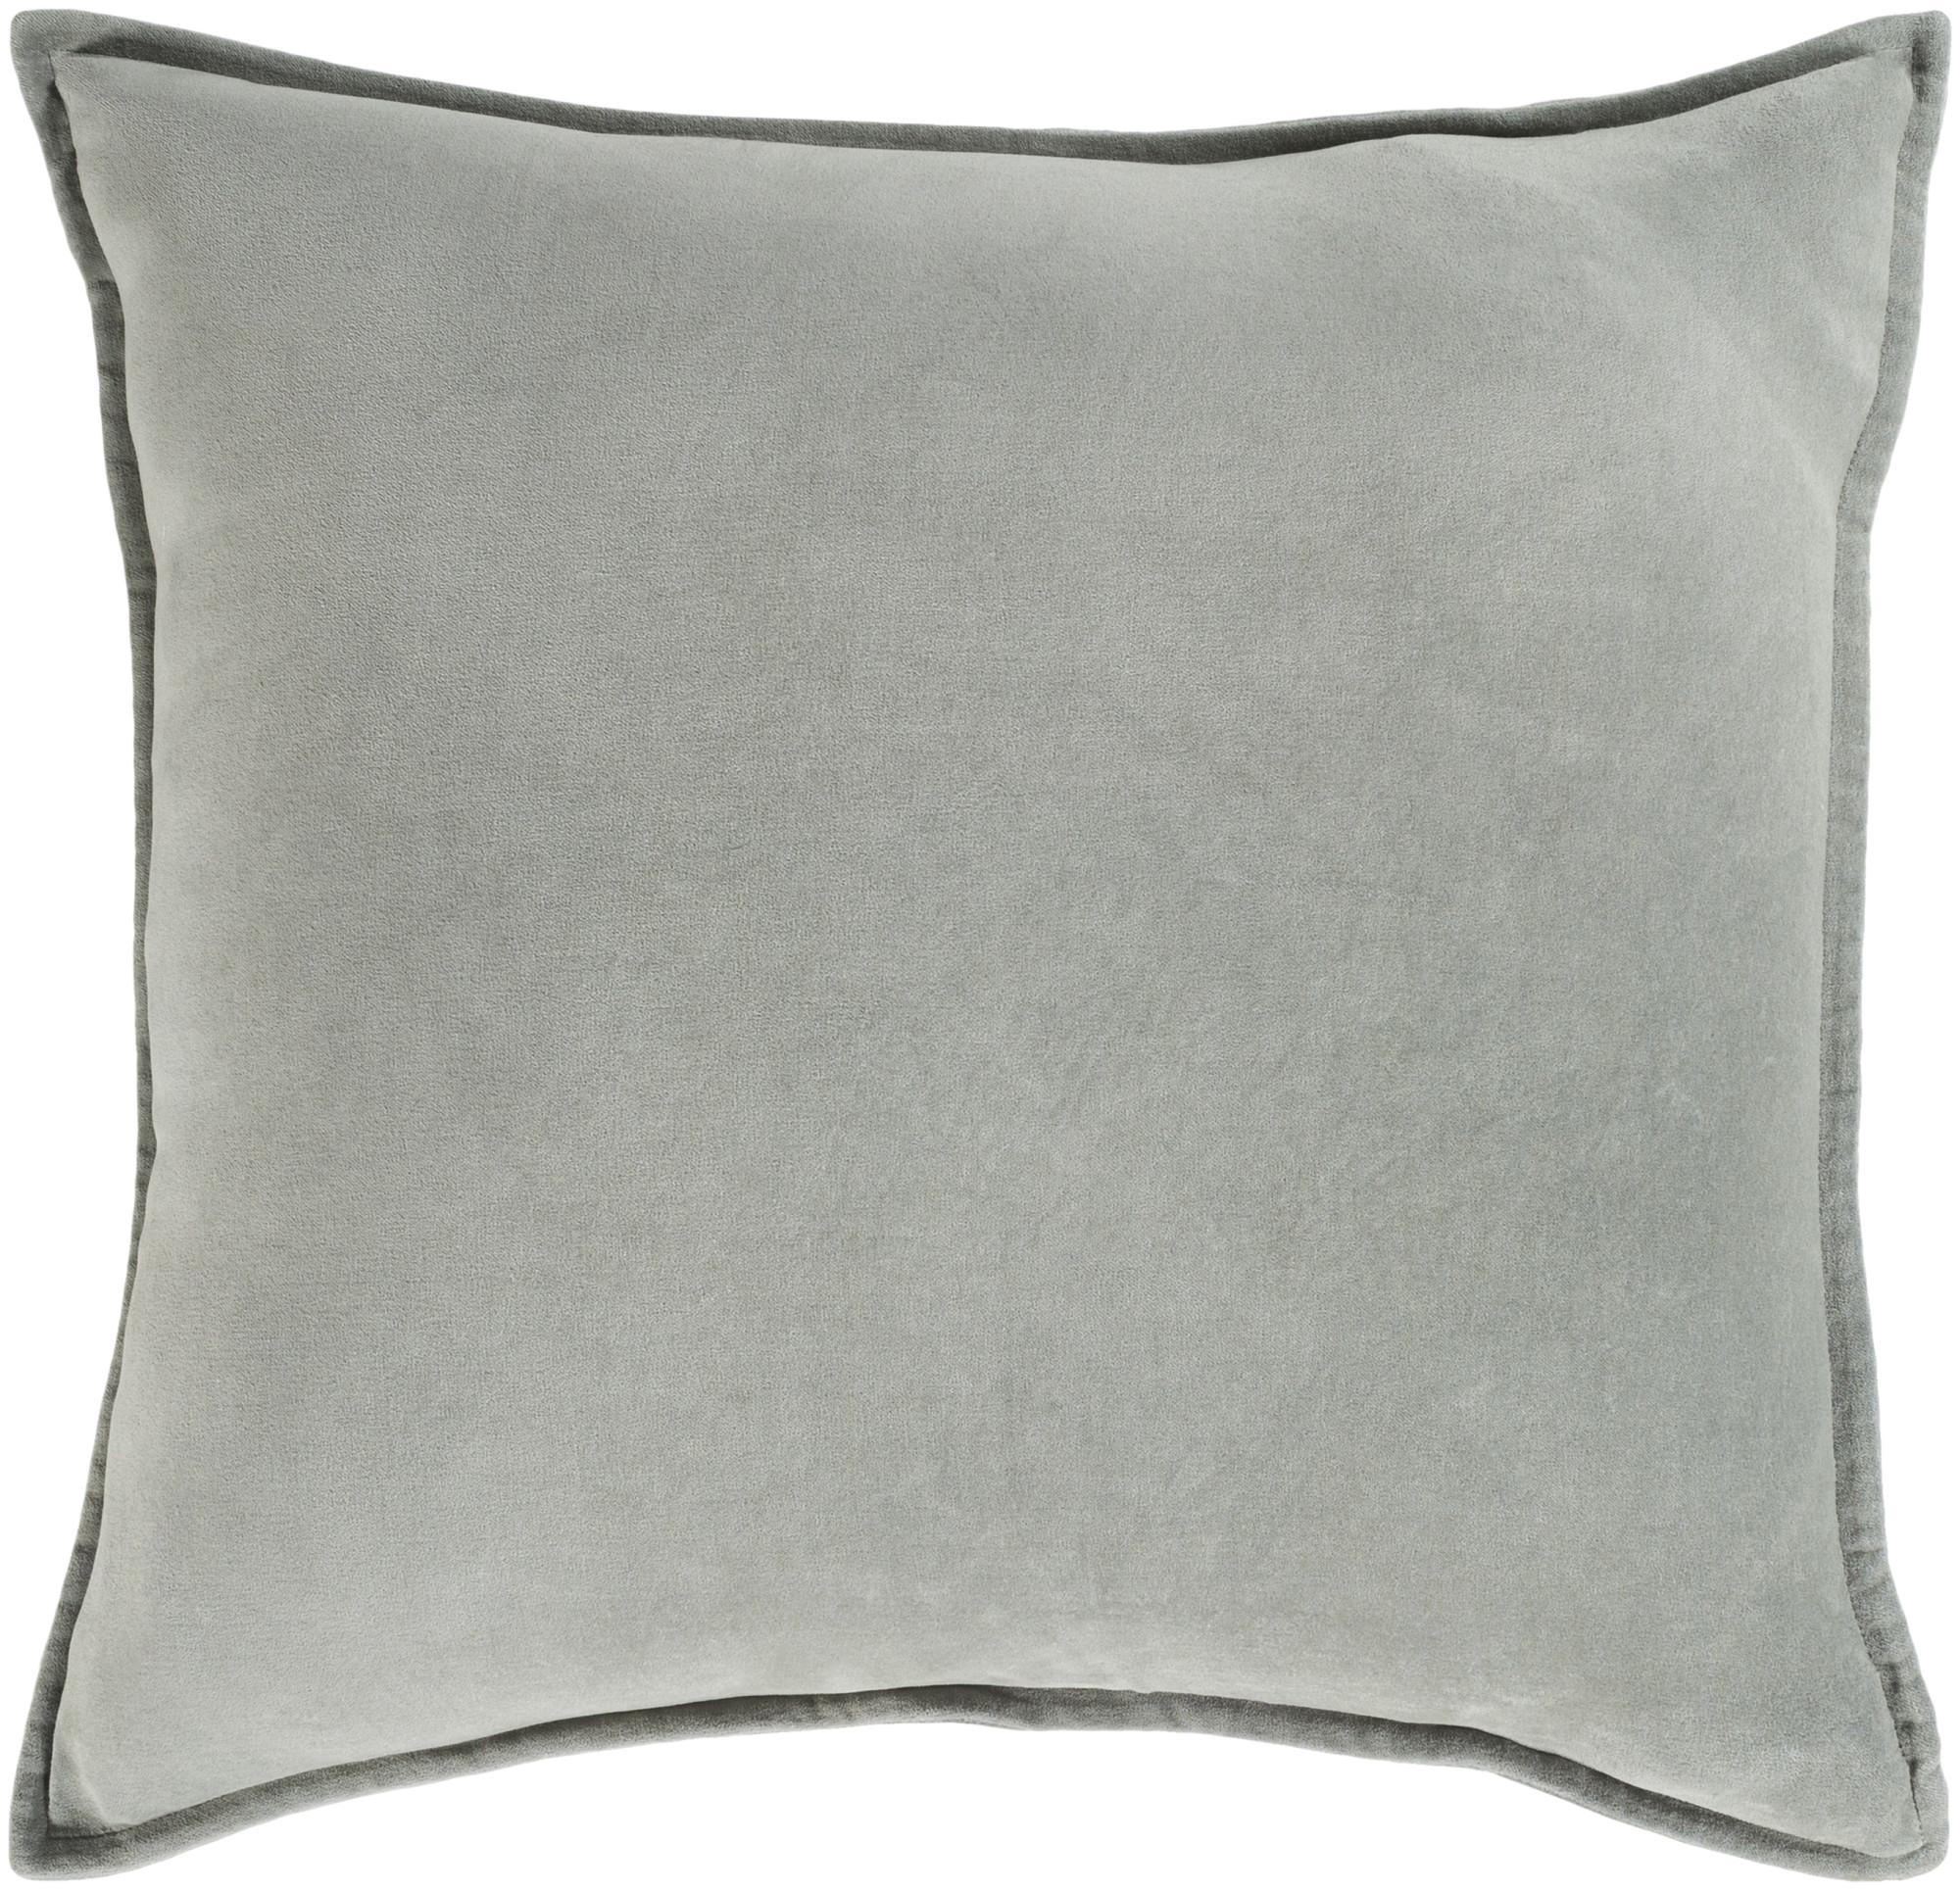 "Surya CV-VELV-1320 Cotton Velvet 20"" Wide Rectangular Solid Cotton Accent Pillow"